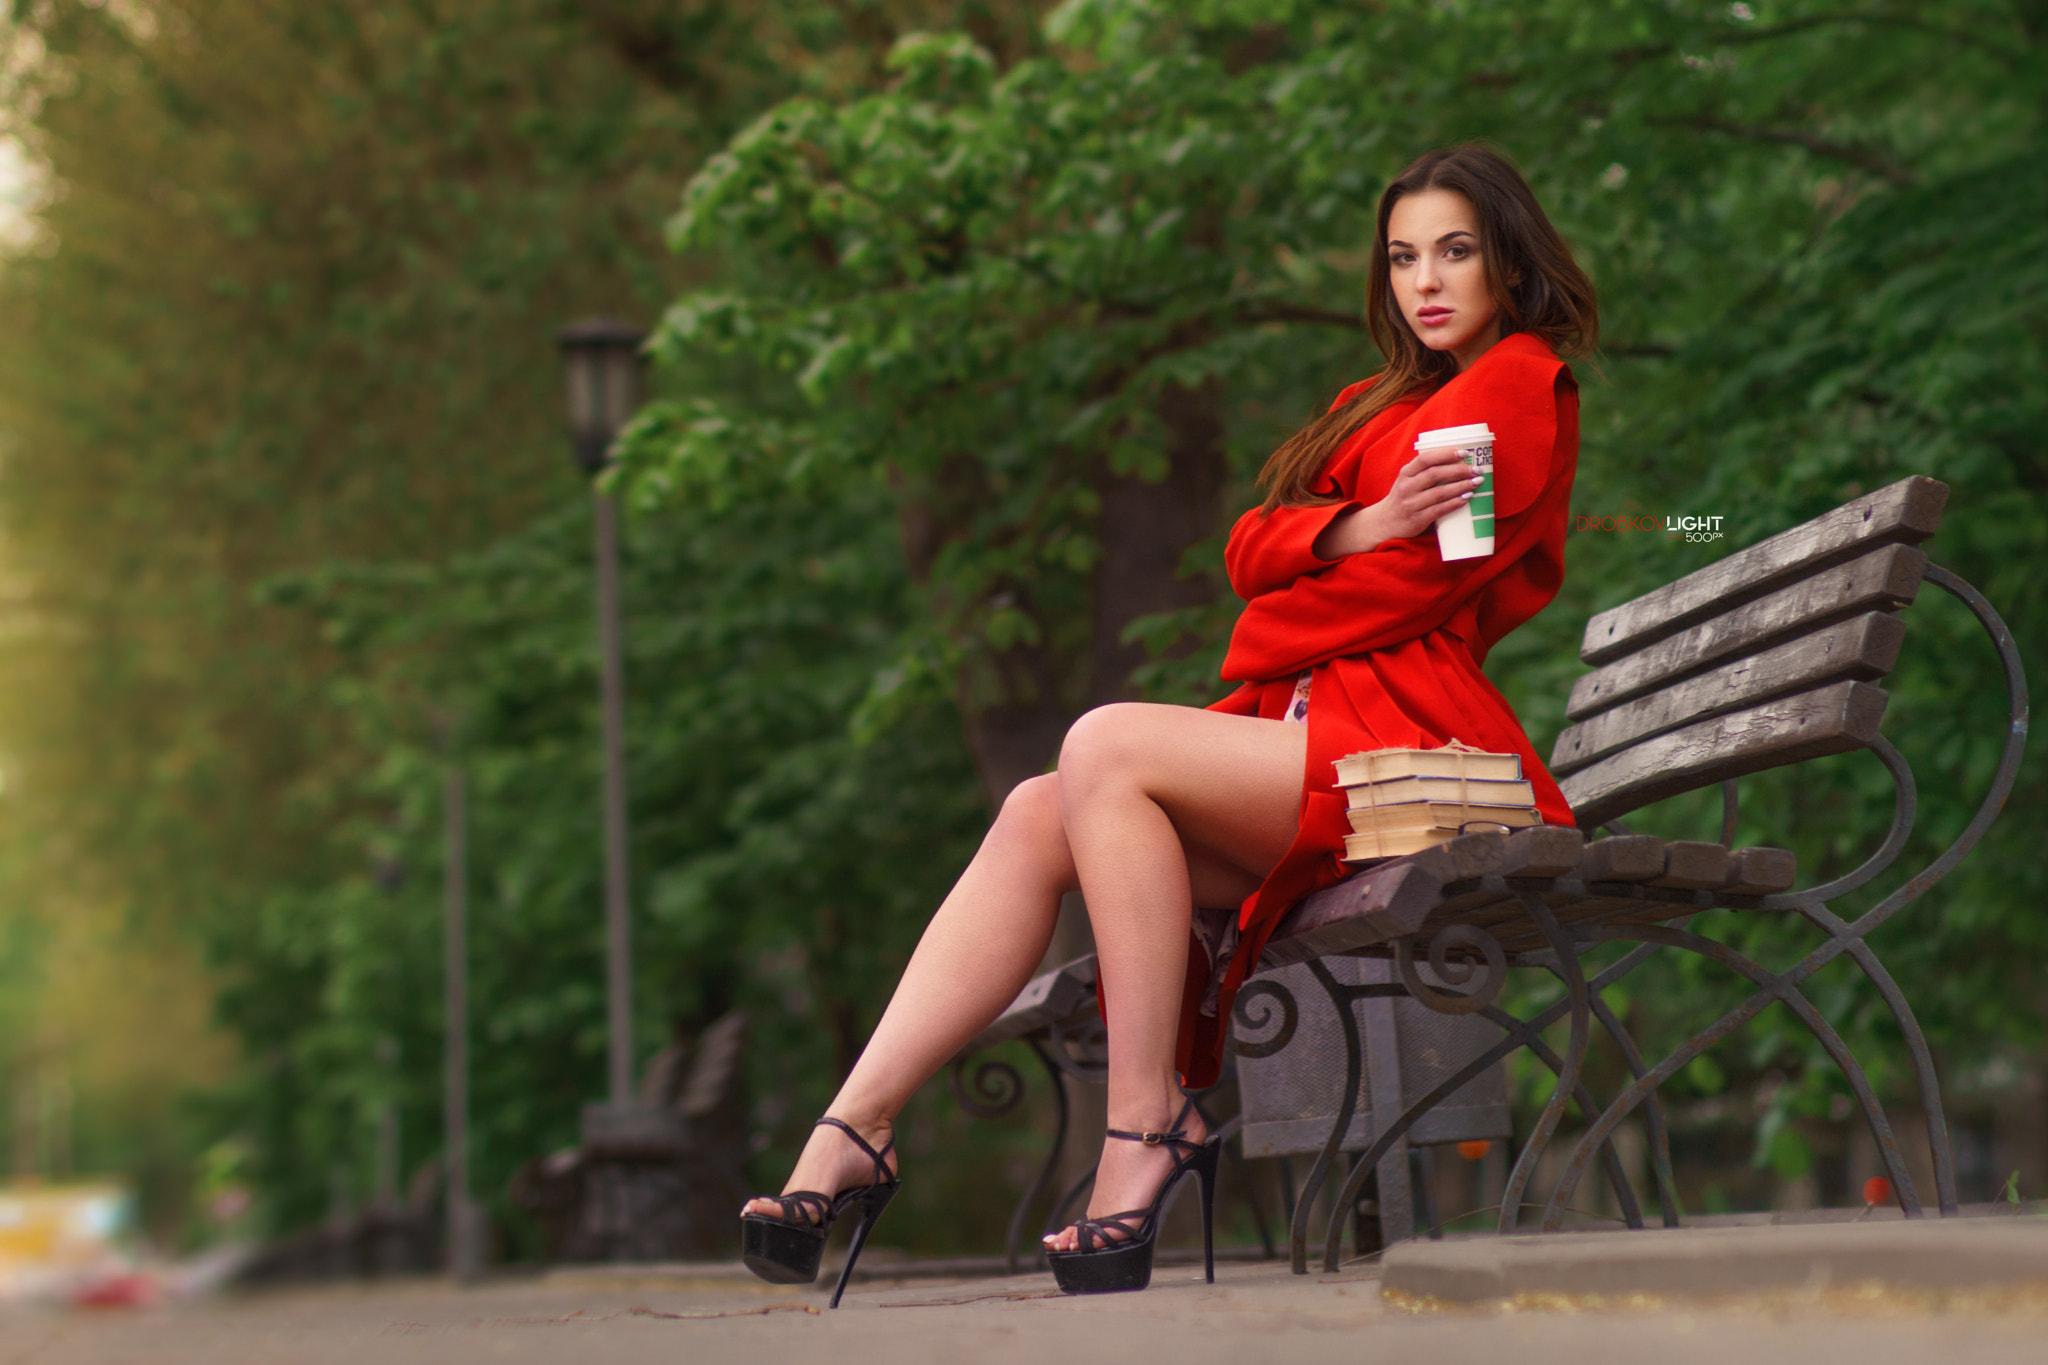 People 2048x1365 women books dress high heels park bench women outdoors Alexander Drobkov red coat sitting Public arms crossed Alisa on bench coats